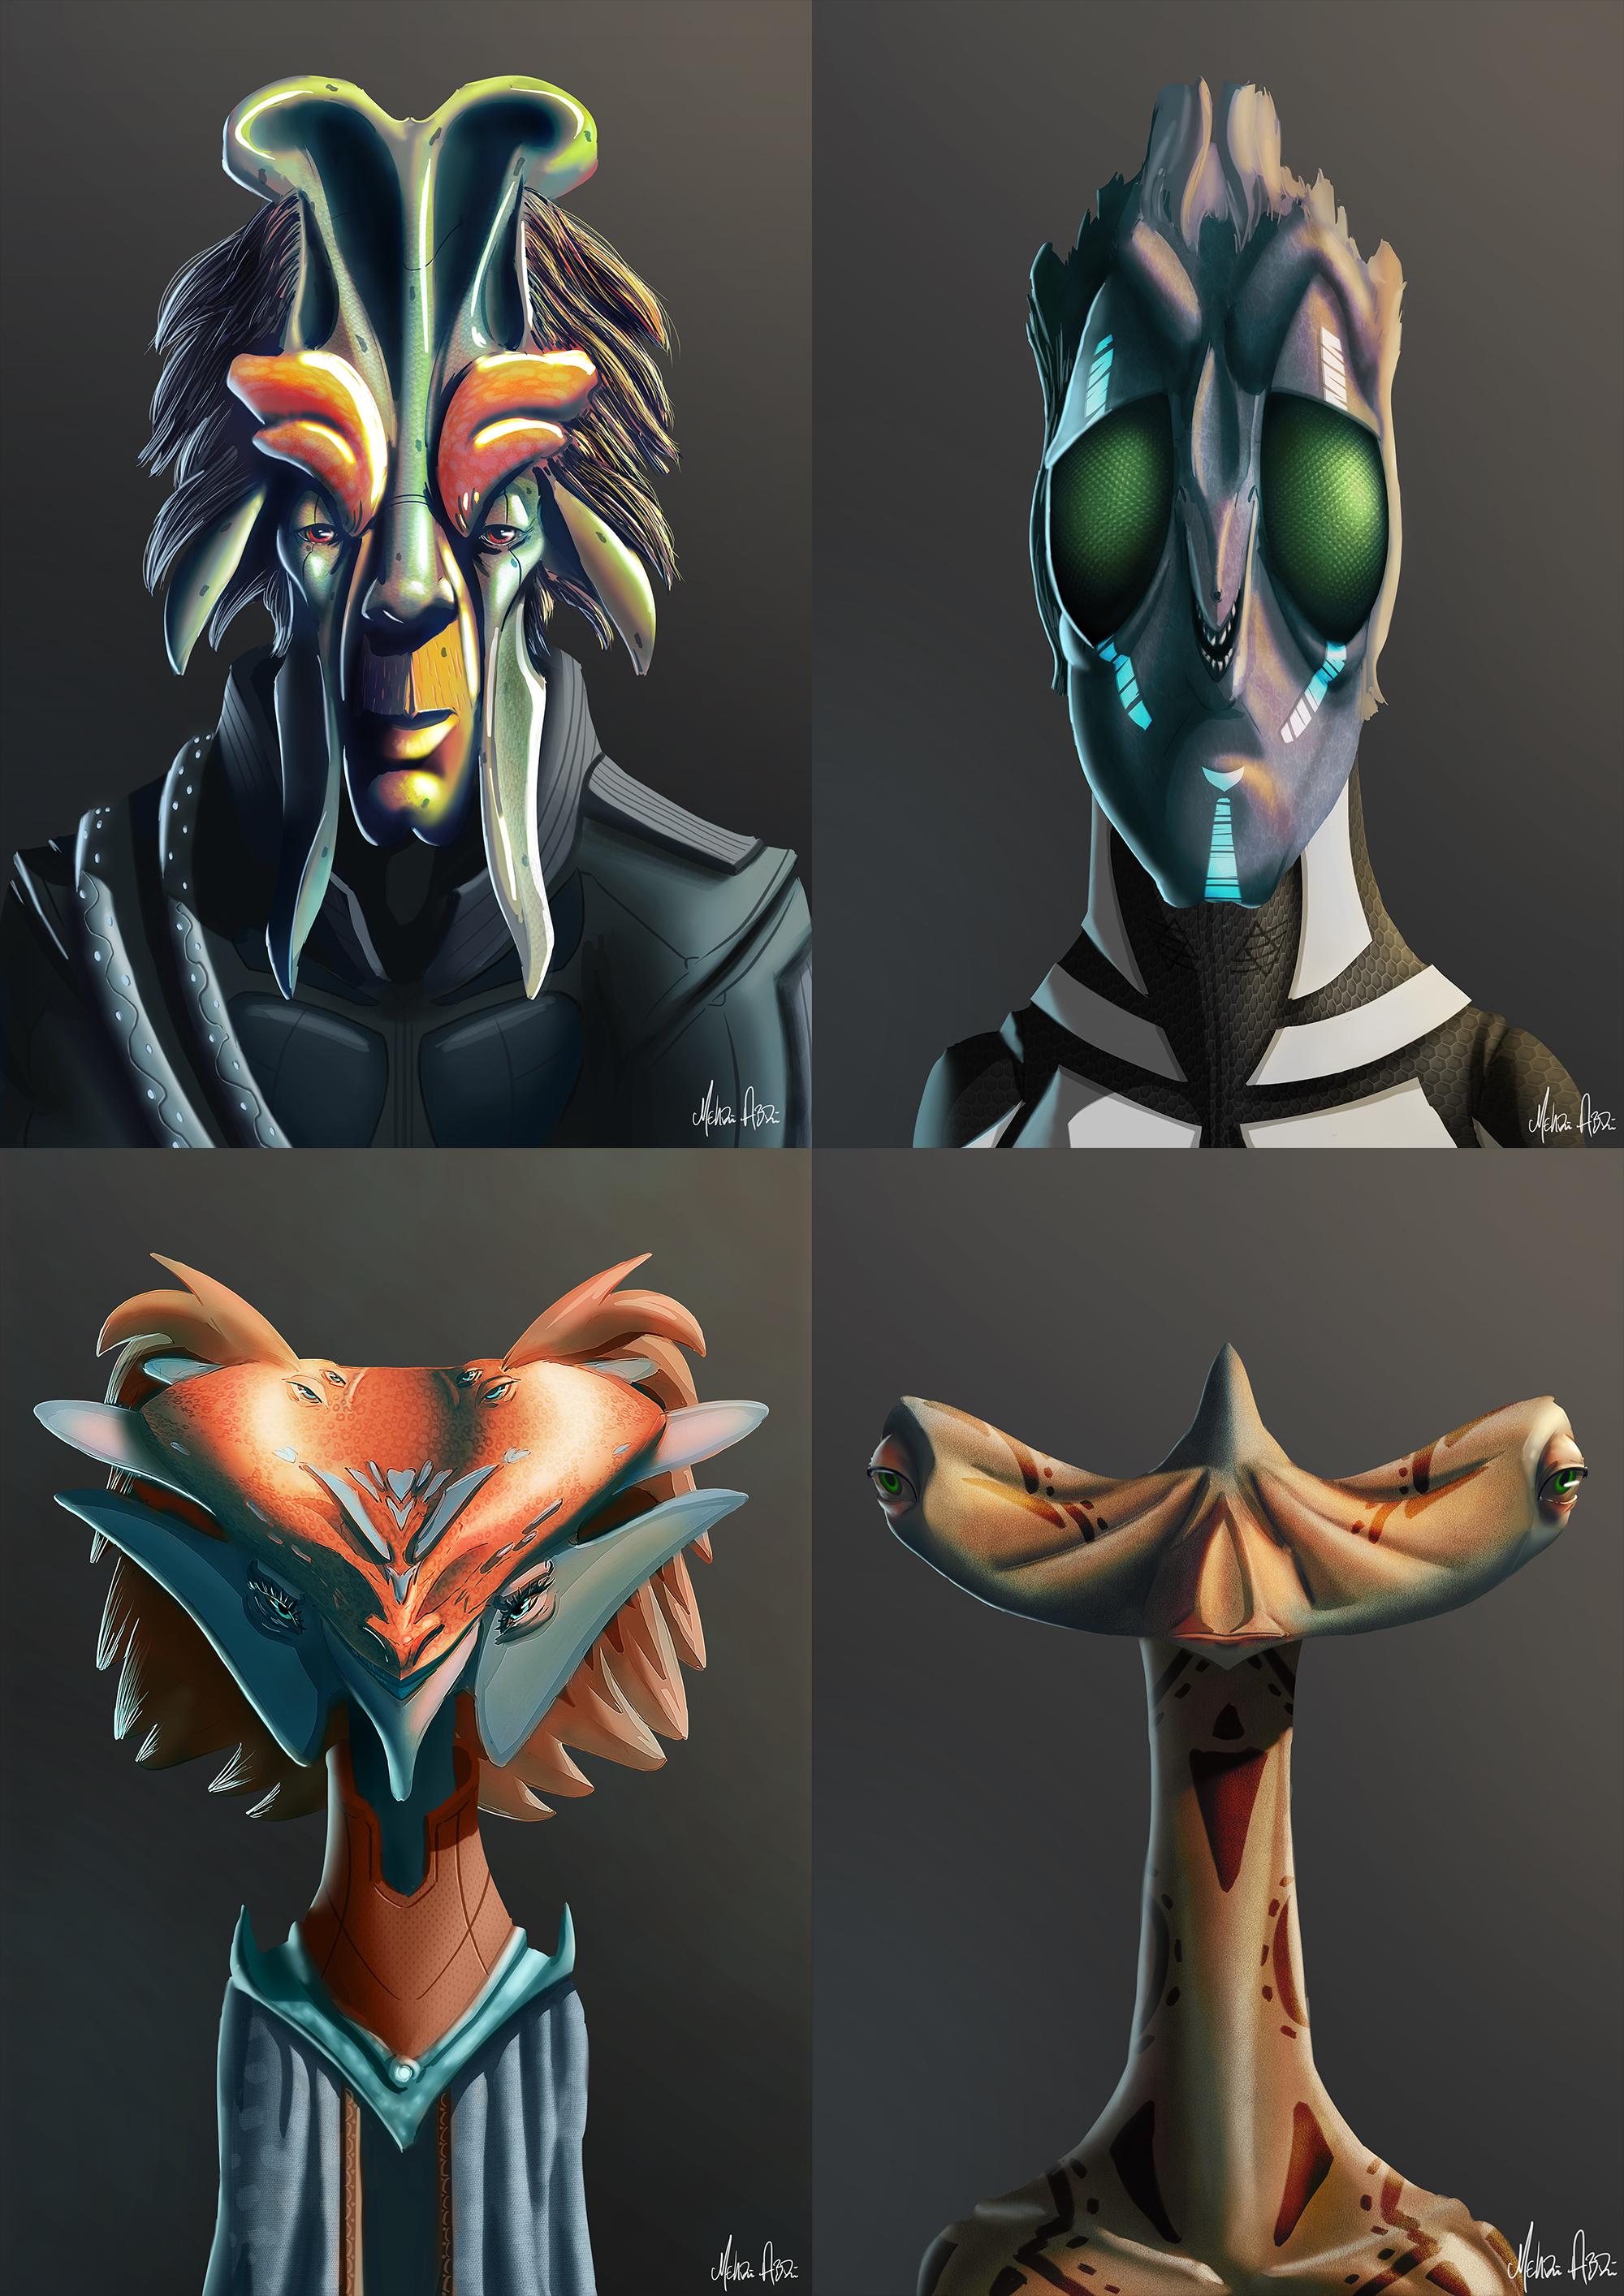 //www.mehdiabdi.fr/wp-content/uploads/2019/07/Aliens.png-copy.jpg